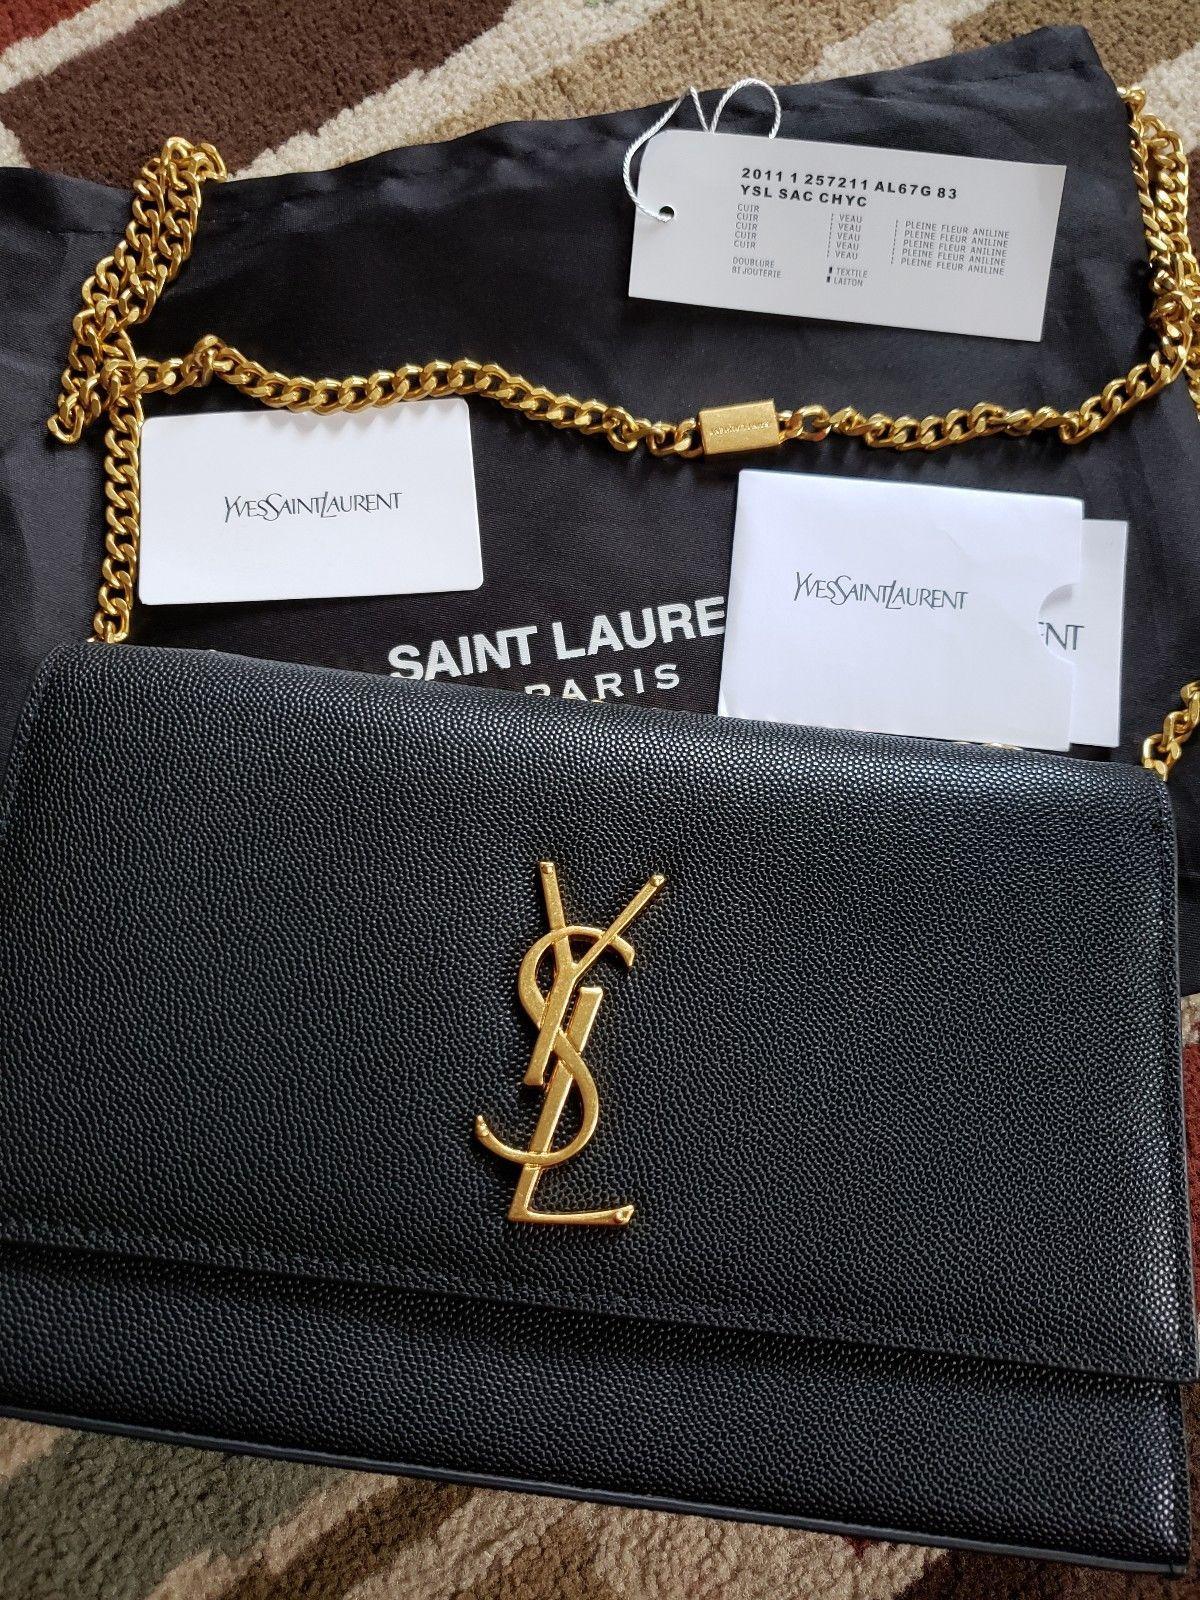 aad02008f1e YSL SAINT LAURENT KATE BAG BLACK MEDIUM GOLD HARDWARE | Saint Lauren ...